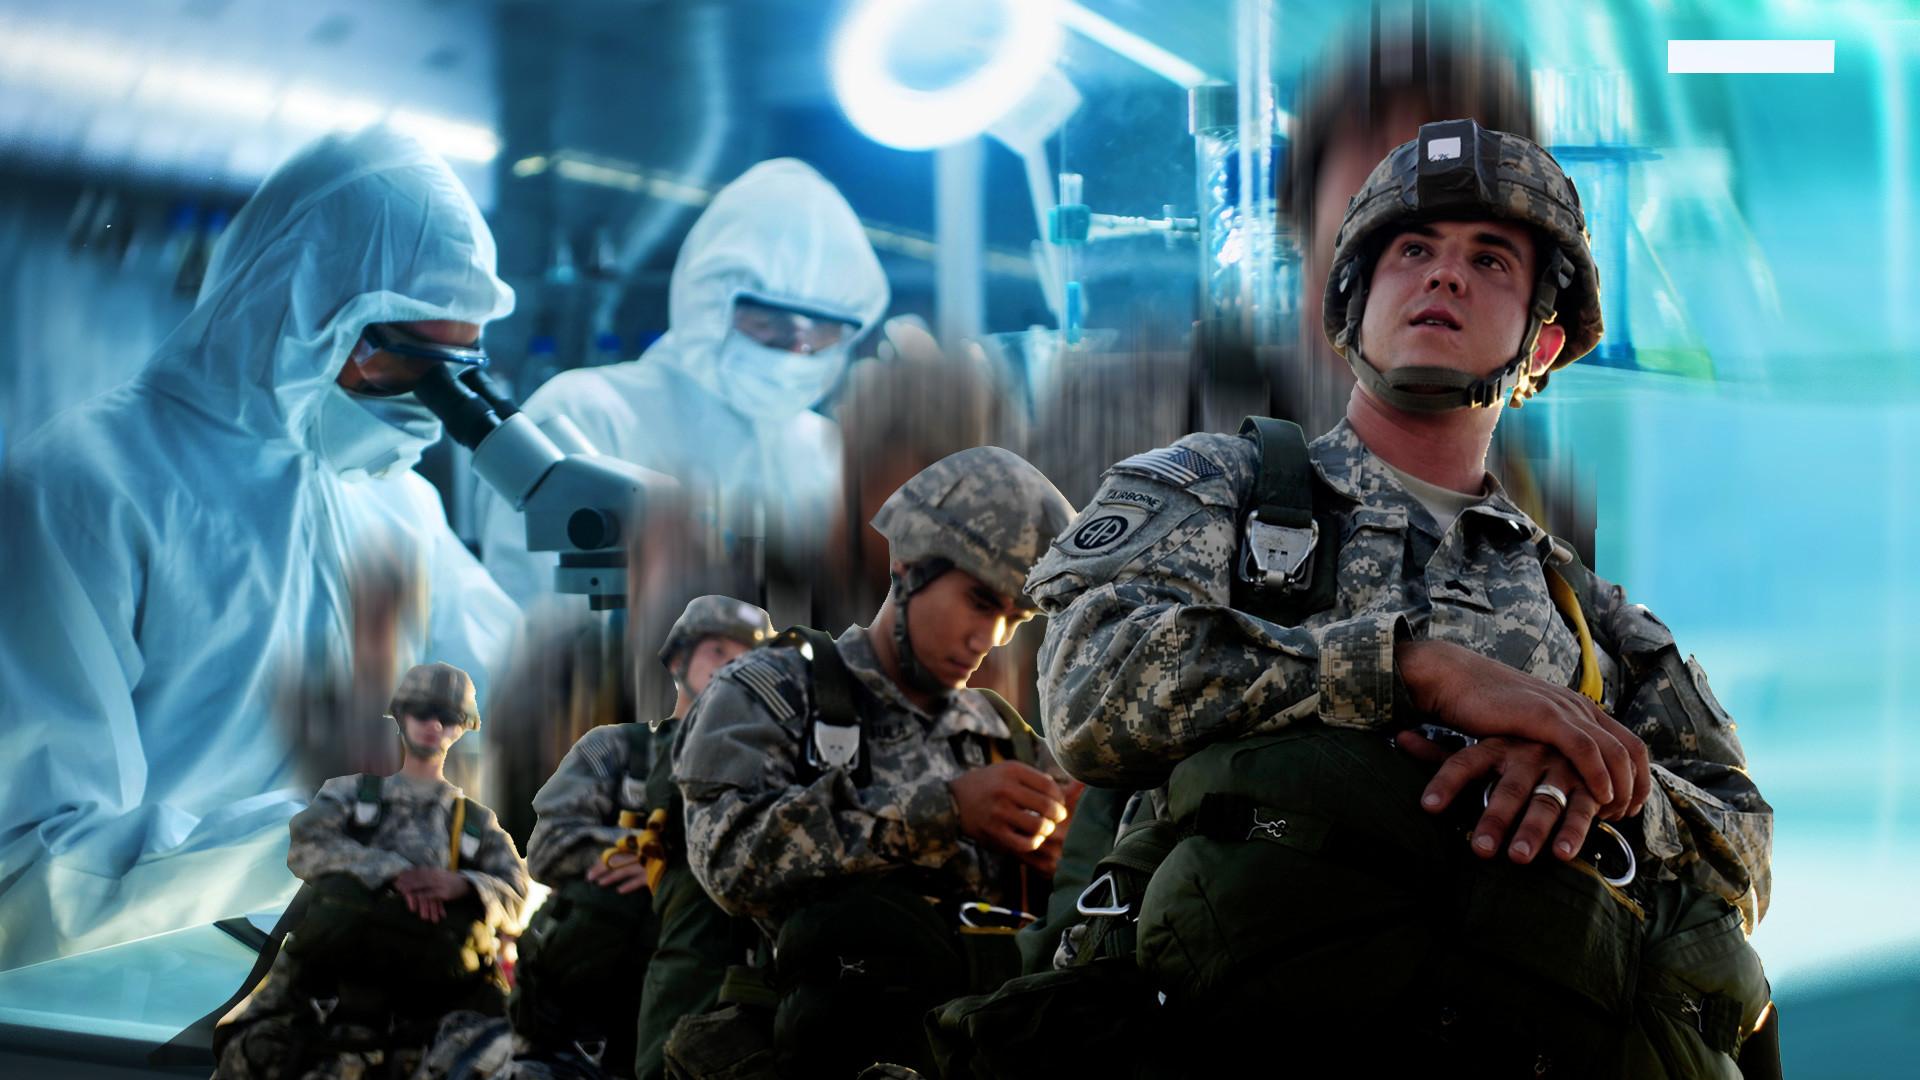 "<p>Коллаж &copy; L!FE. Фото: &copy;&nbsp;Shutterstock &copy;&nbsp;<a href=""https://www.flickr.com/photos/soldiersmediacenter/4997949023/"" target=""_blank"">flickr.com/The U.S. Army</a></p>"